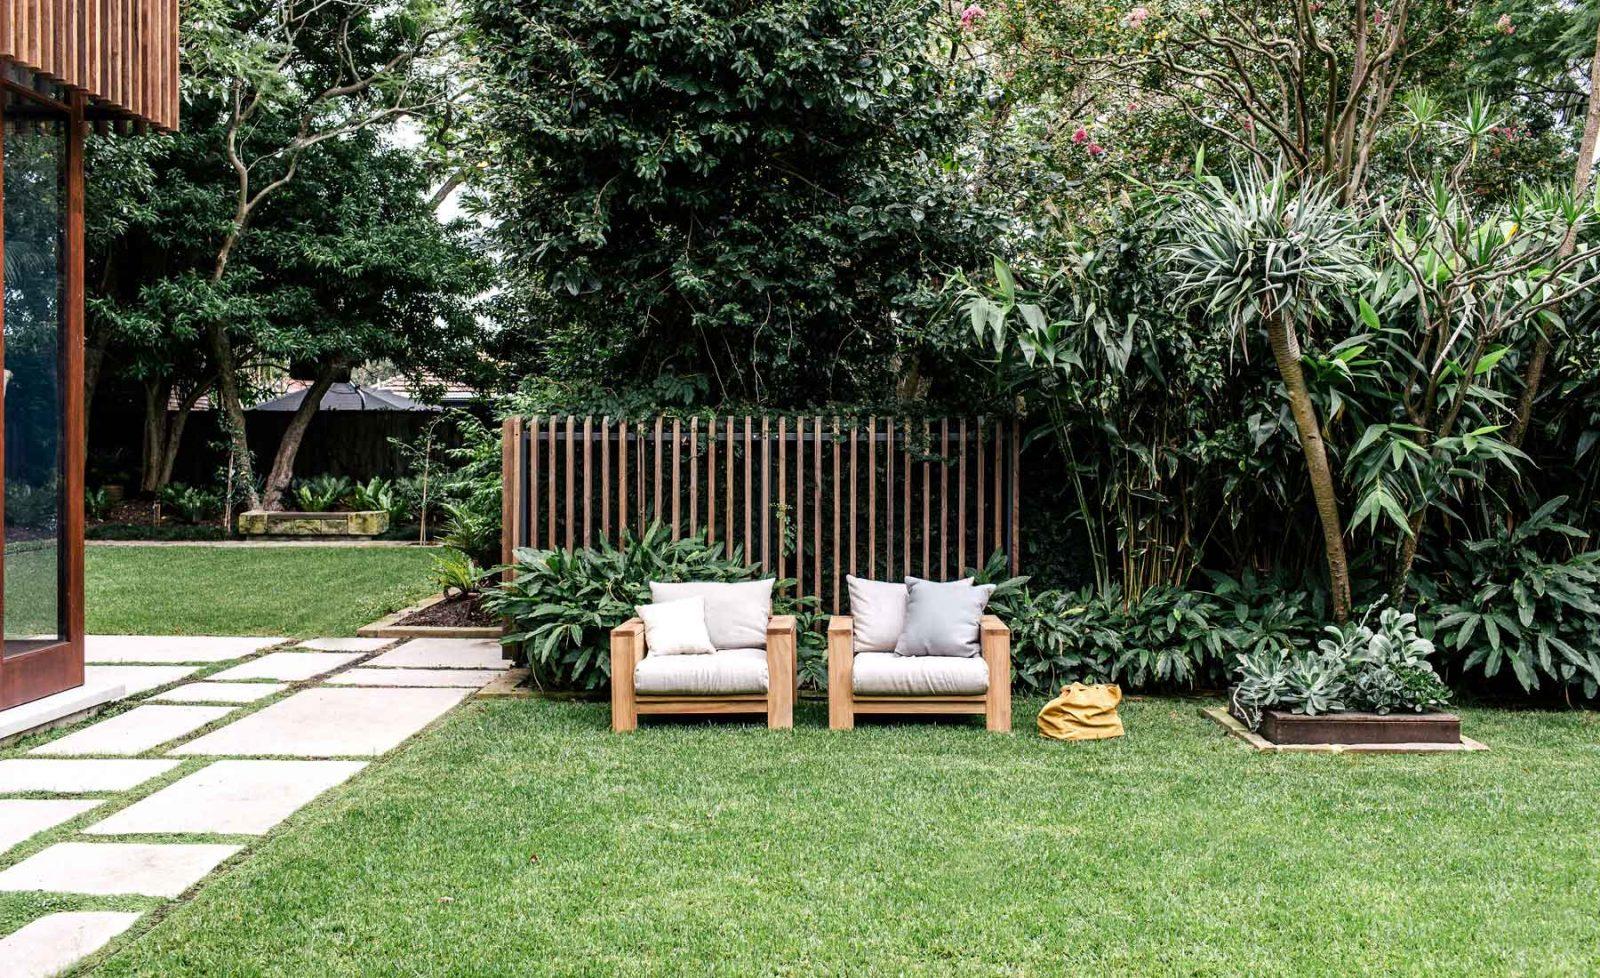 3 Quick Landscape Improvements That Increase Your Home's Value